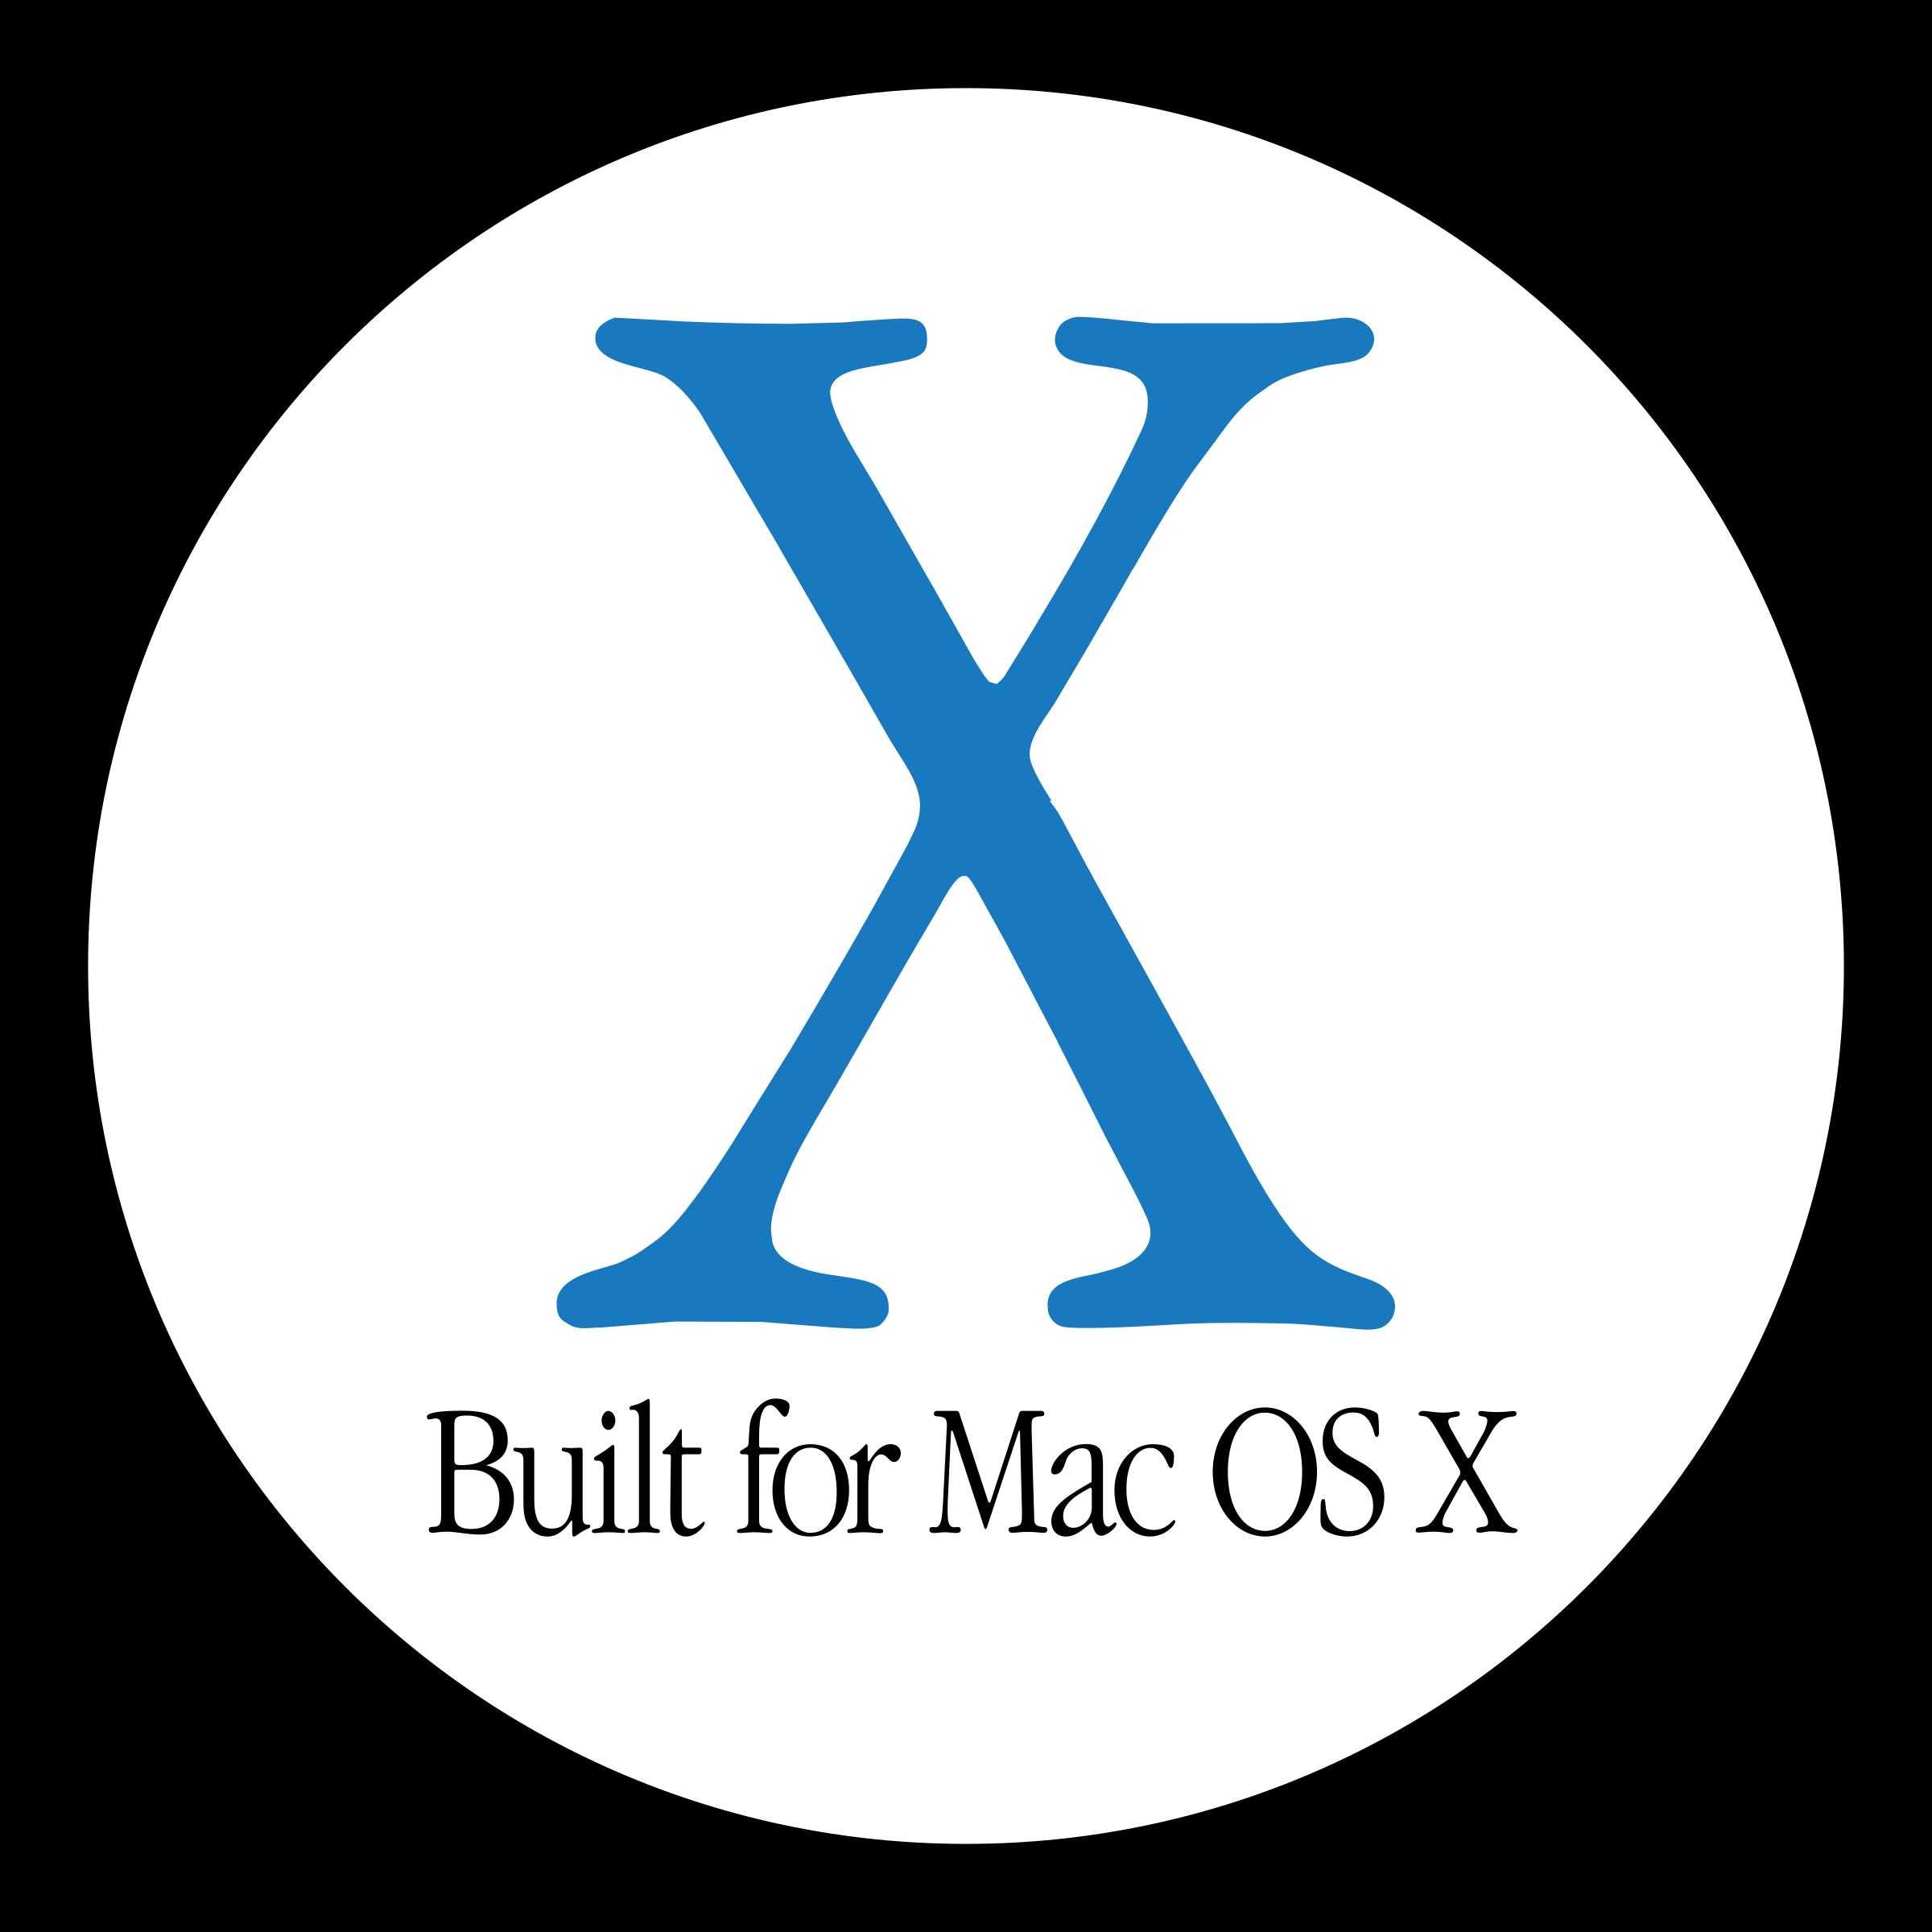 Built for Mac OS X Logo PNG Transparent & SVG Vector.